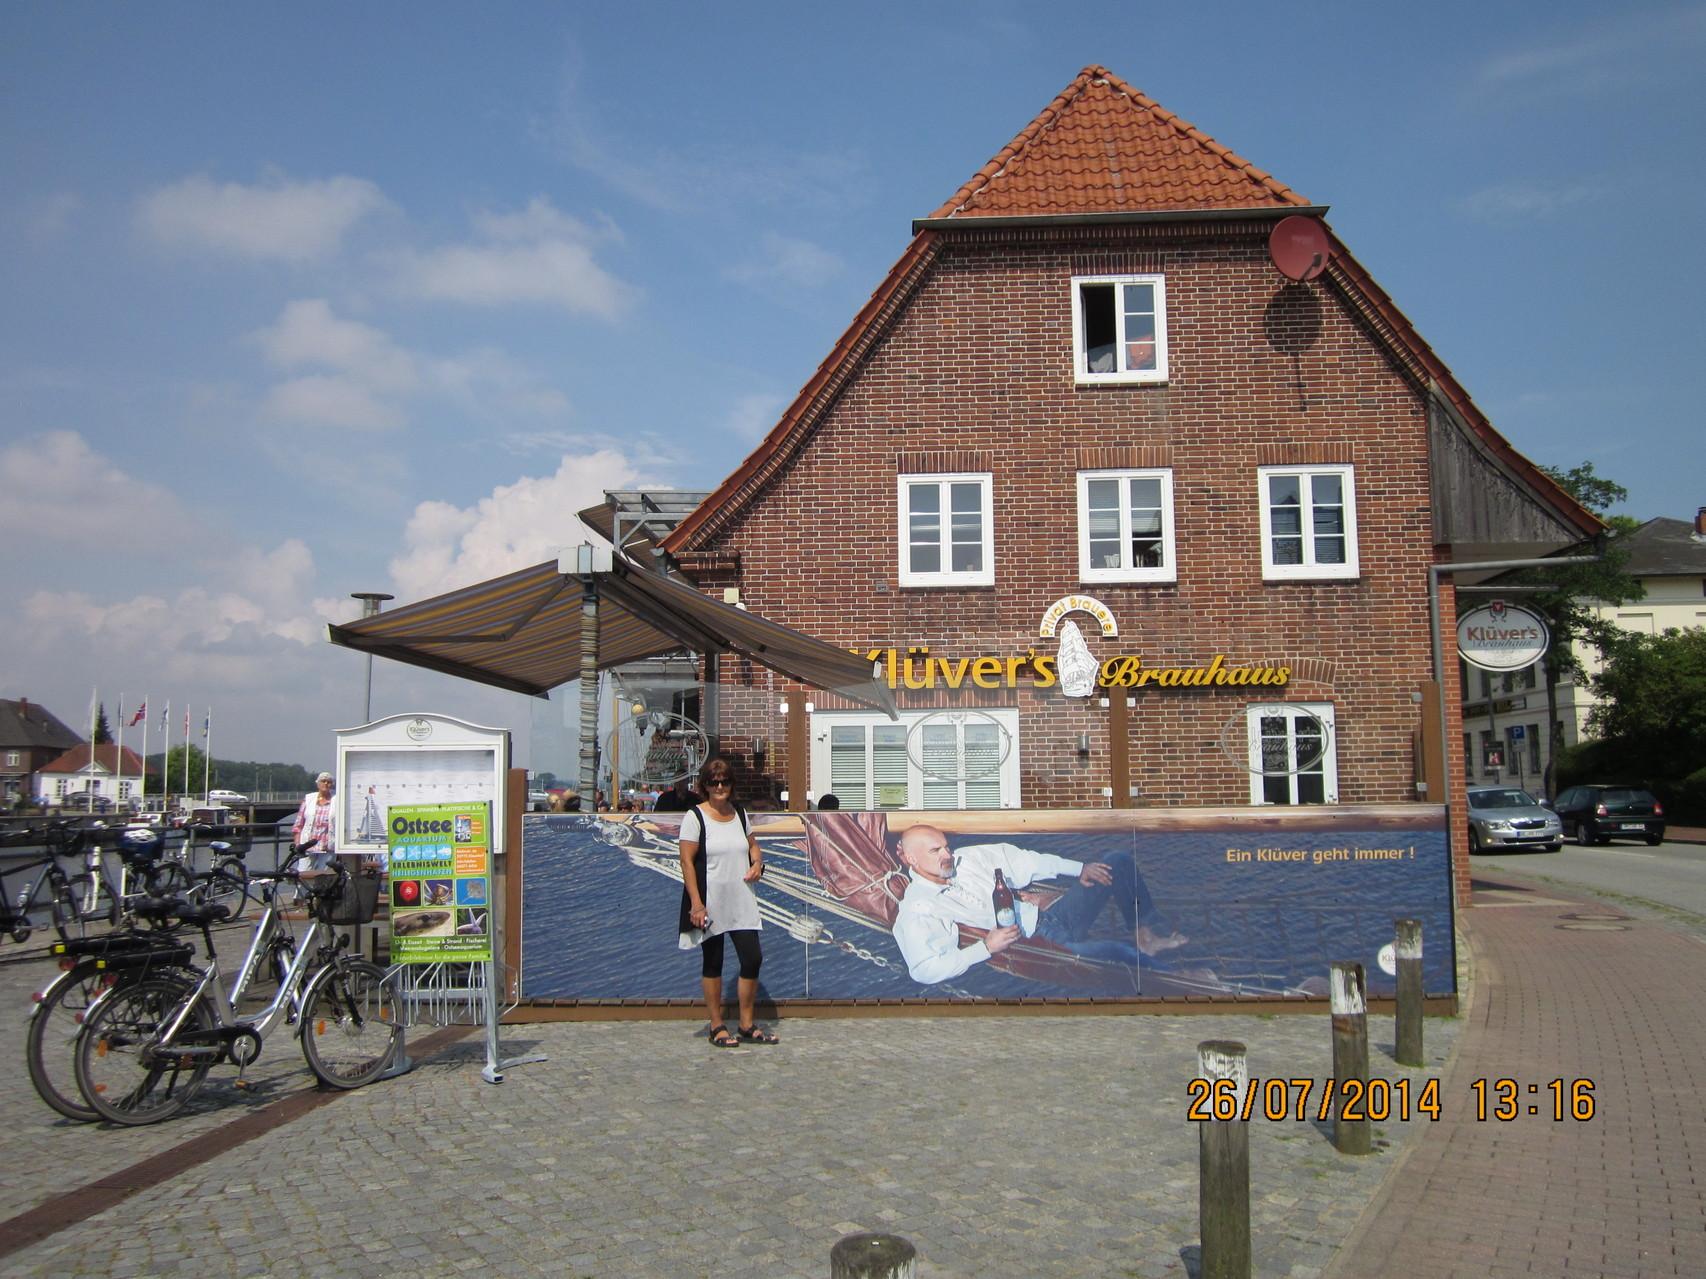 Brauhaus in Neustadt